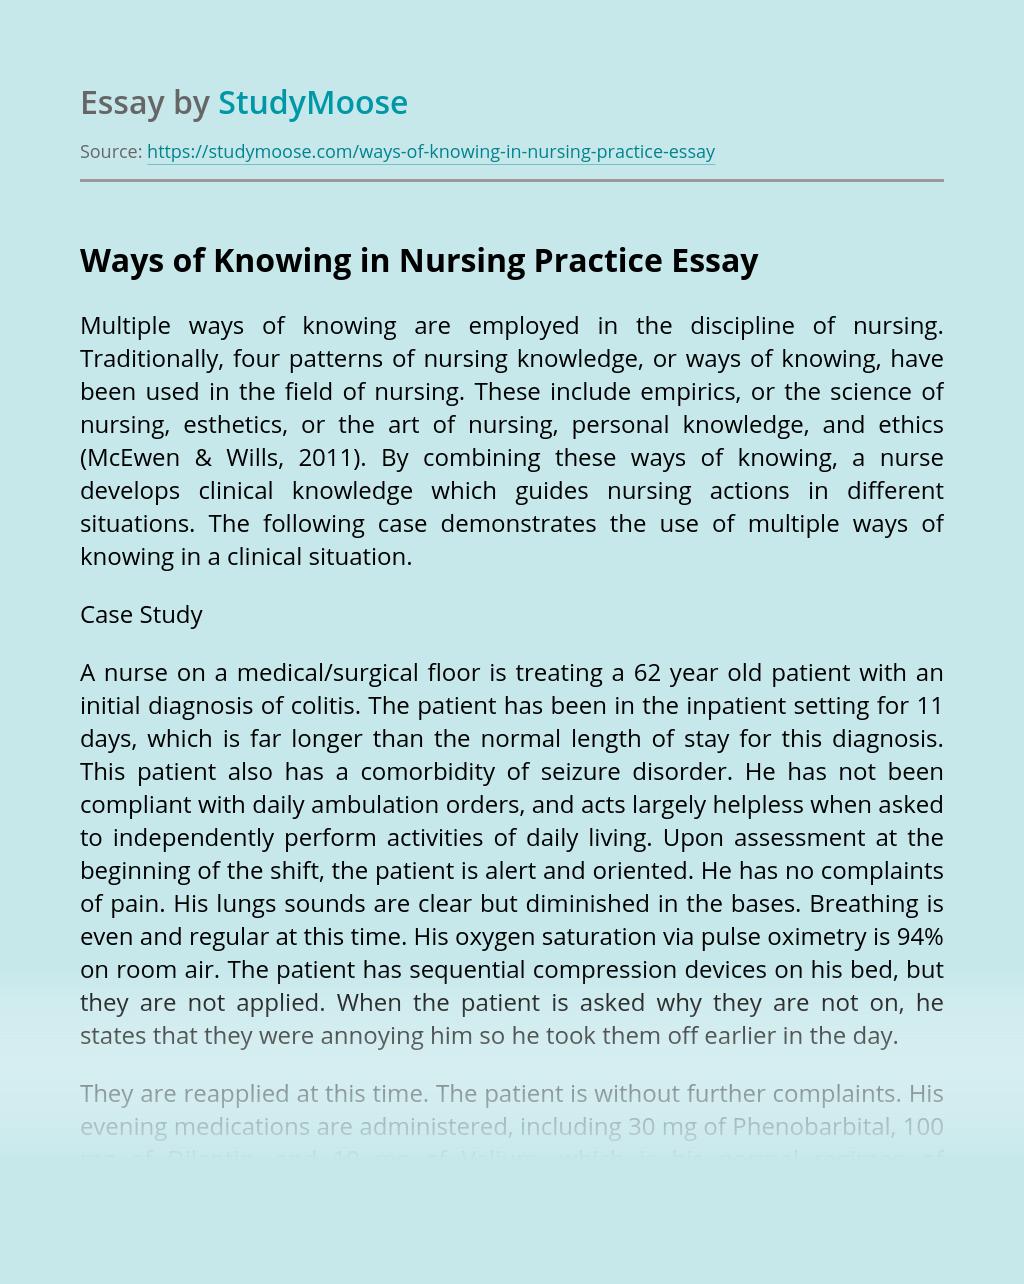 Ways of Knowing in Nursing Practice